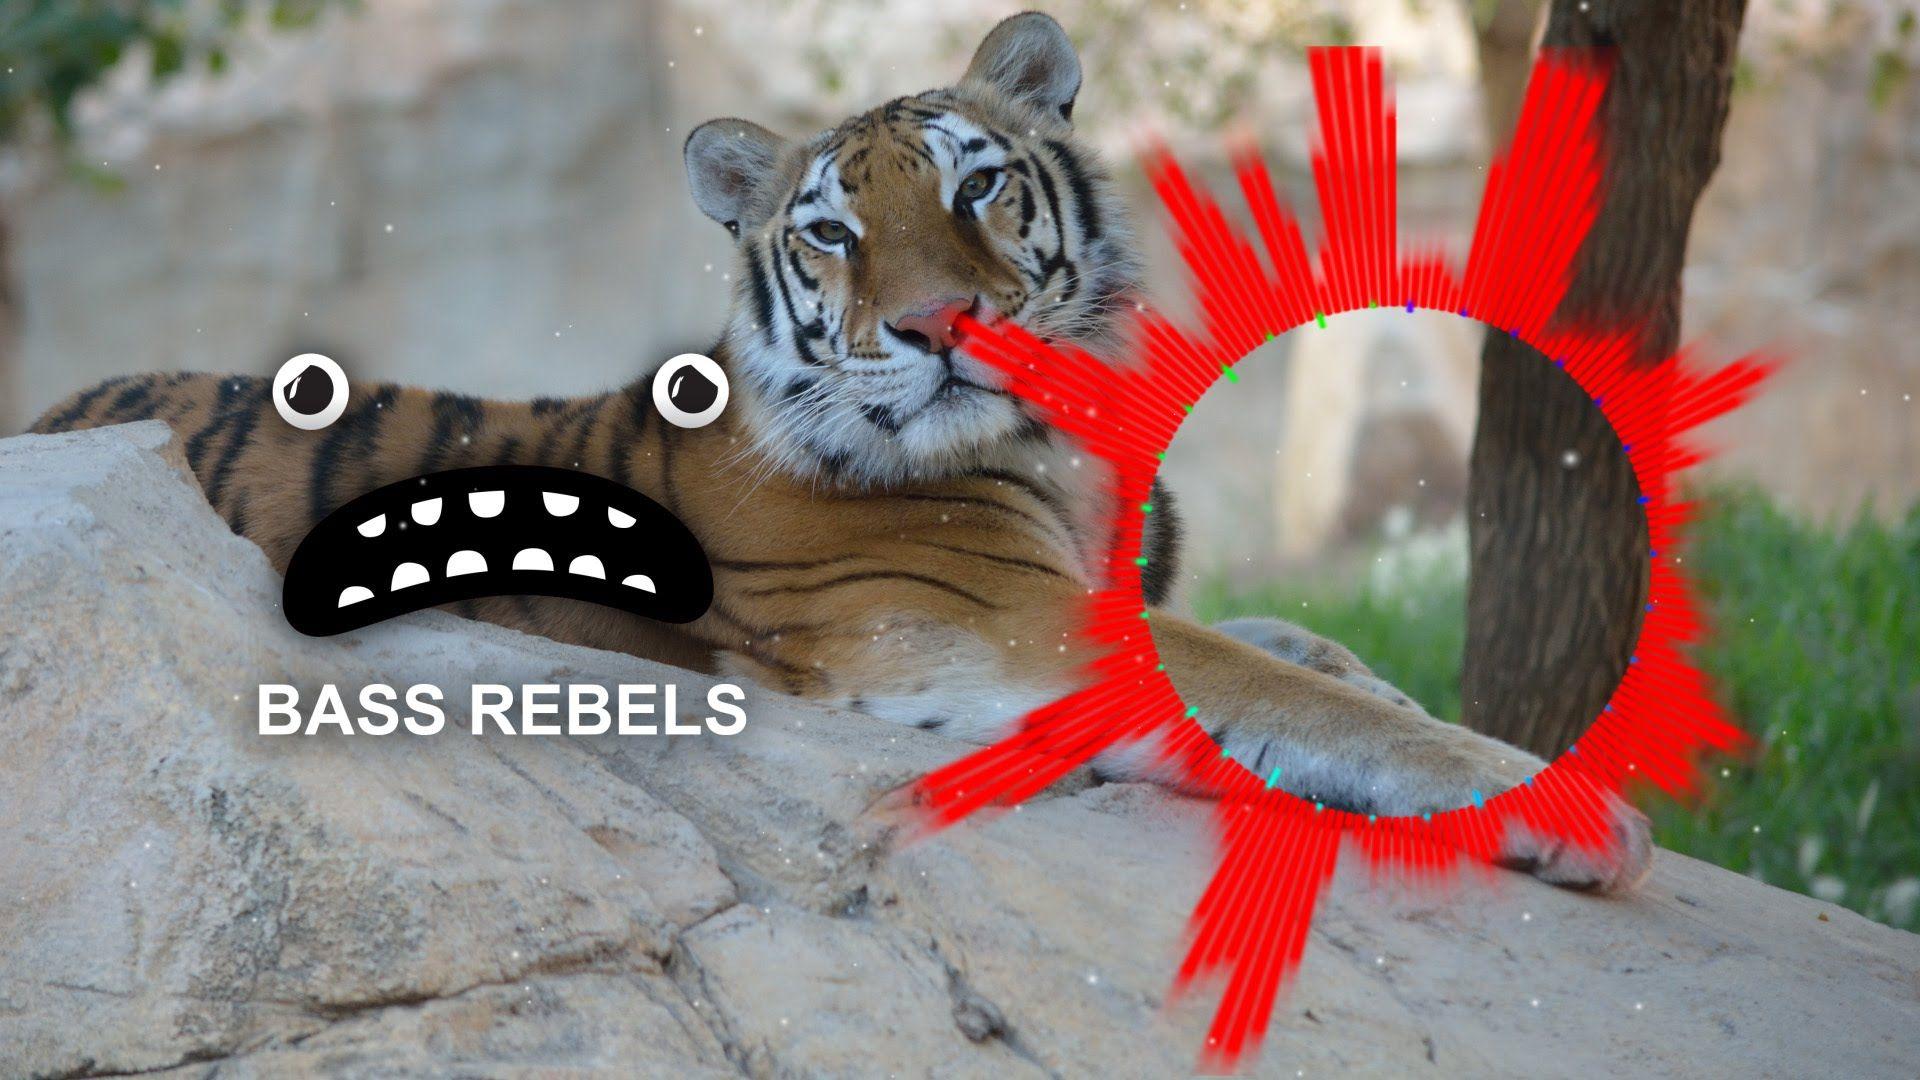 Dawns Tiger Non Copyrighted Music Copyright Music Edm Music Music